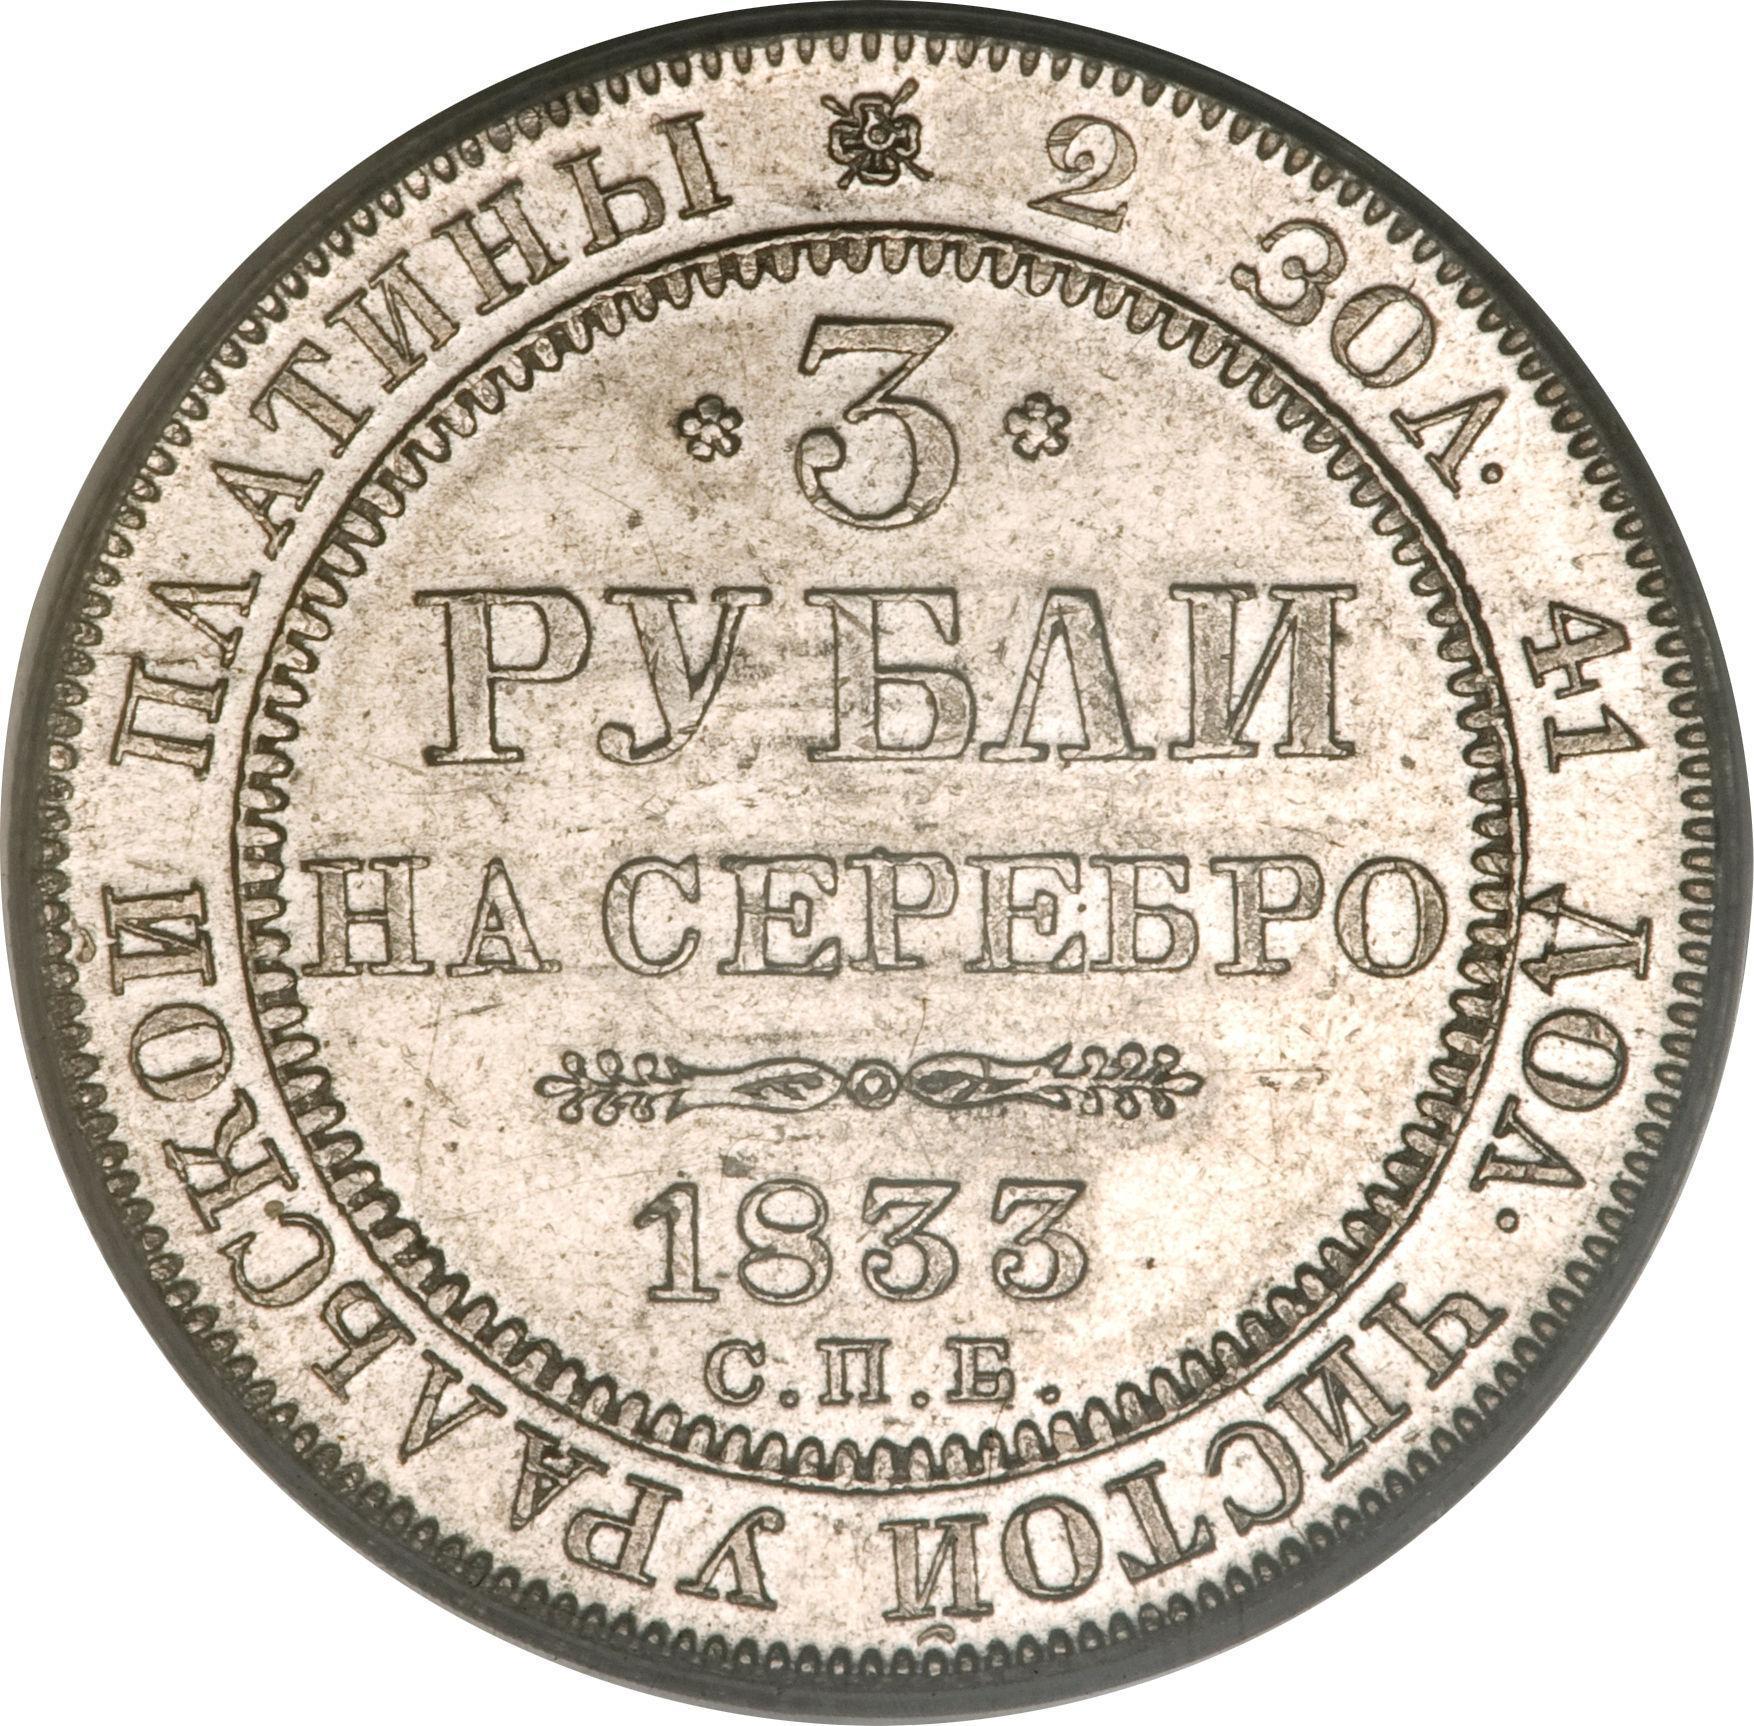 Монета 3 рубля 1833 года Николая I - реверс